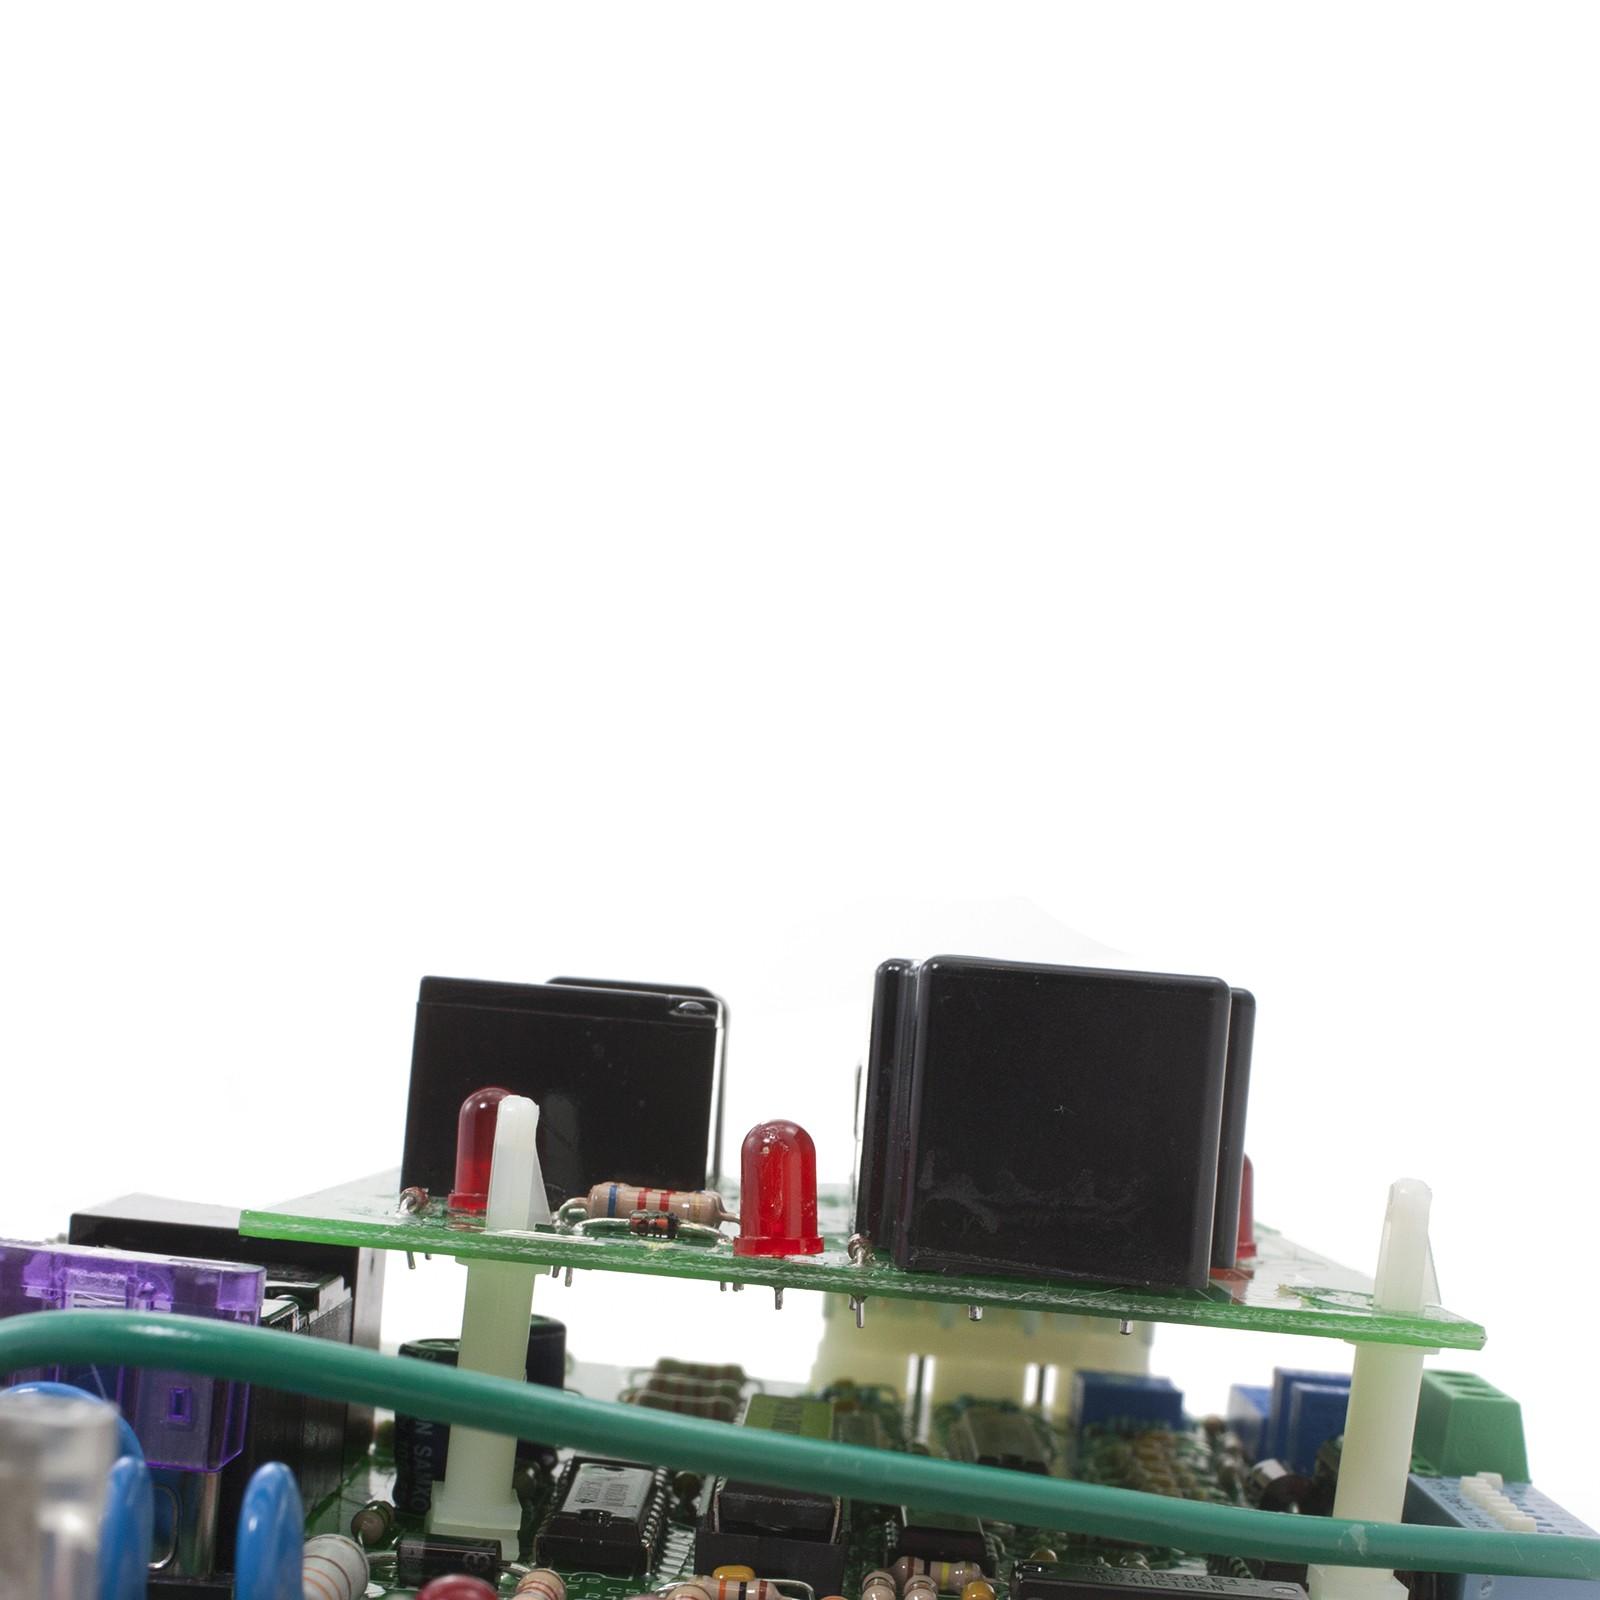 Linear Osco 2510 244 Control Board With Ac Motor Board